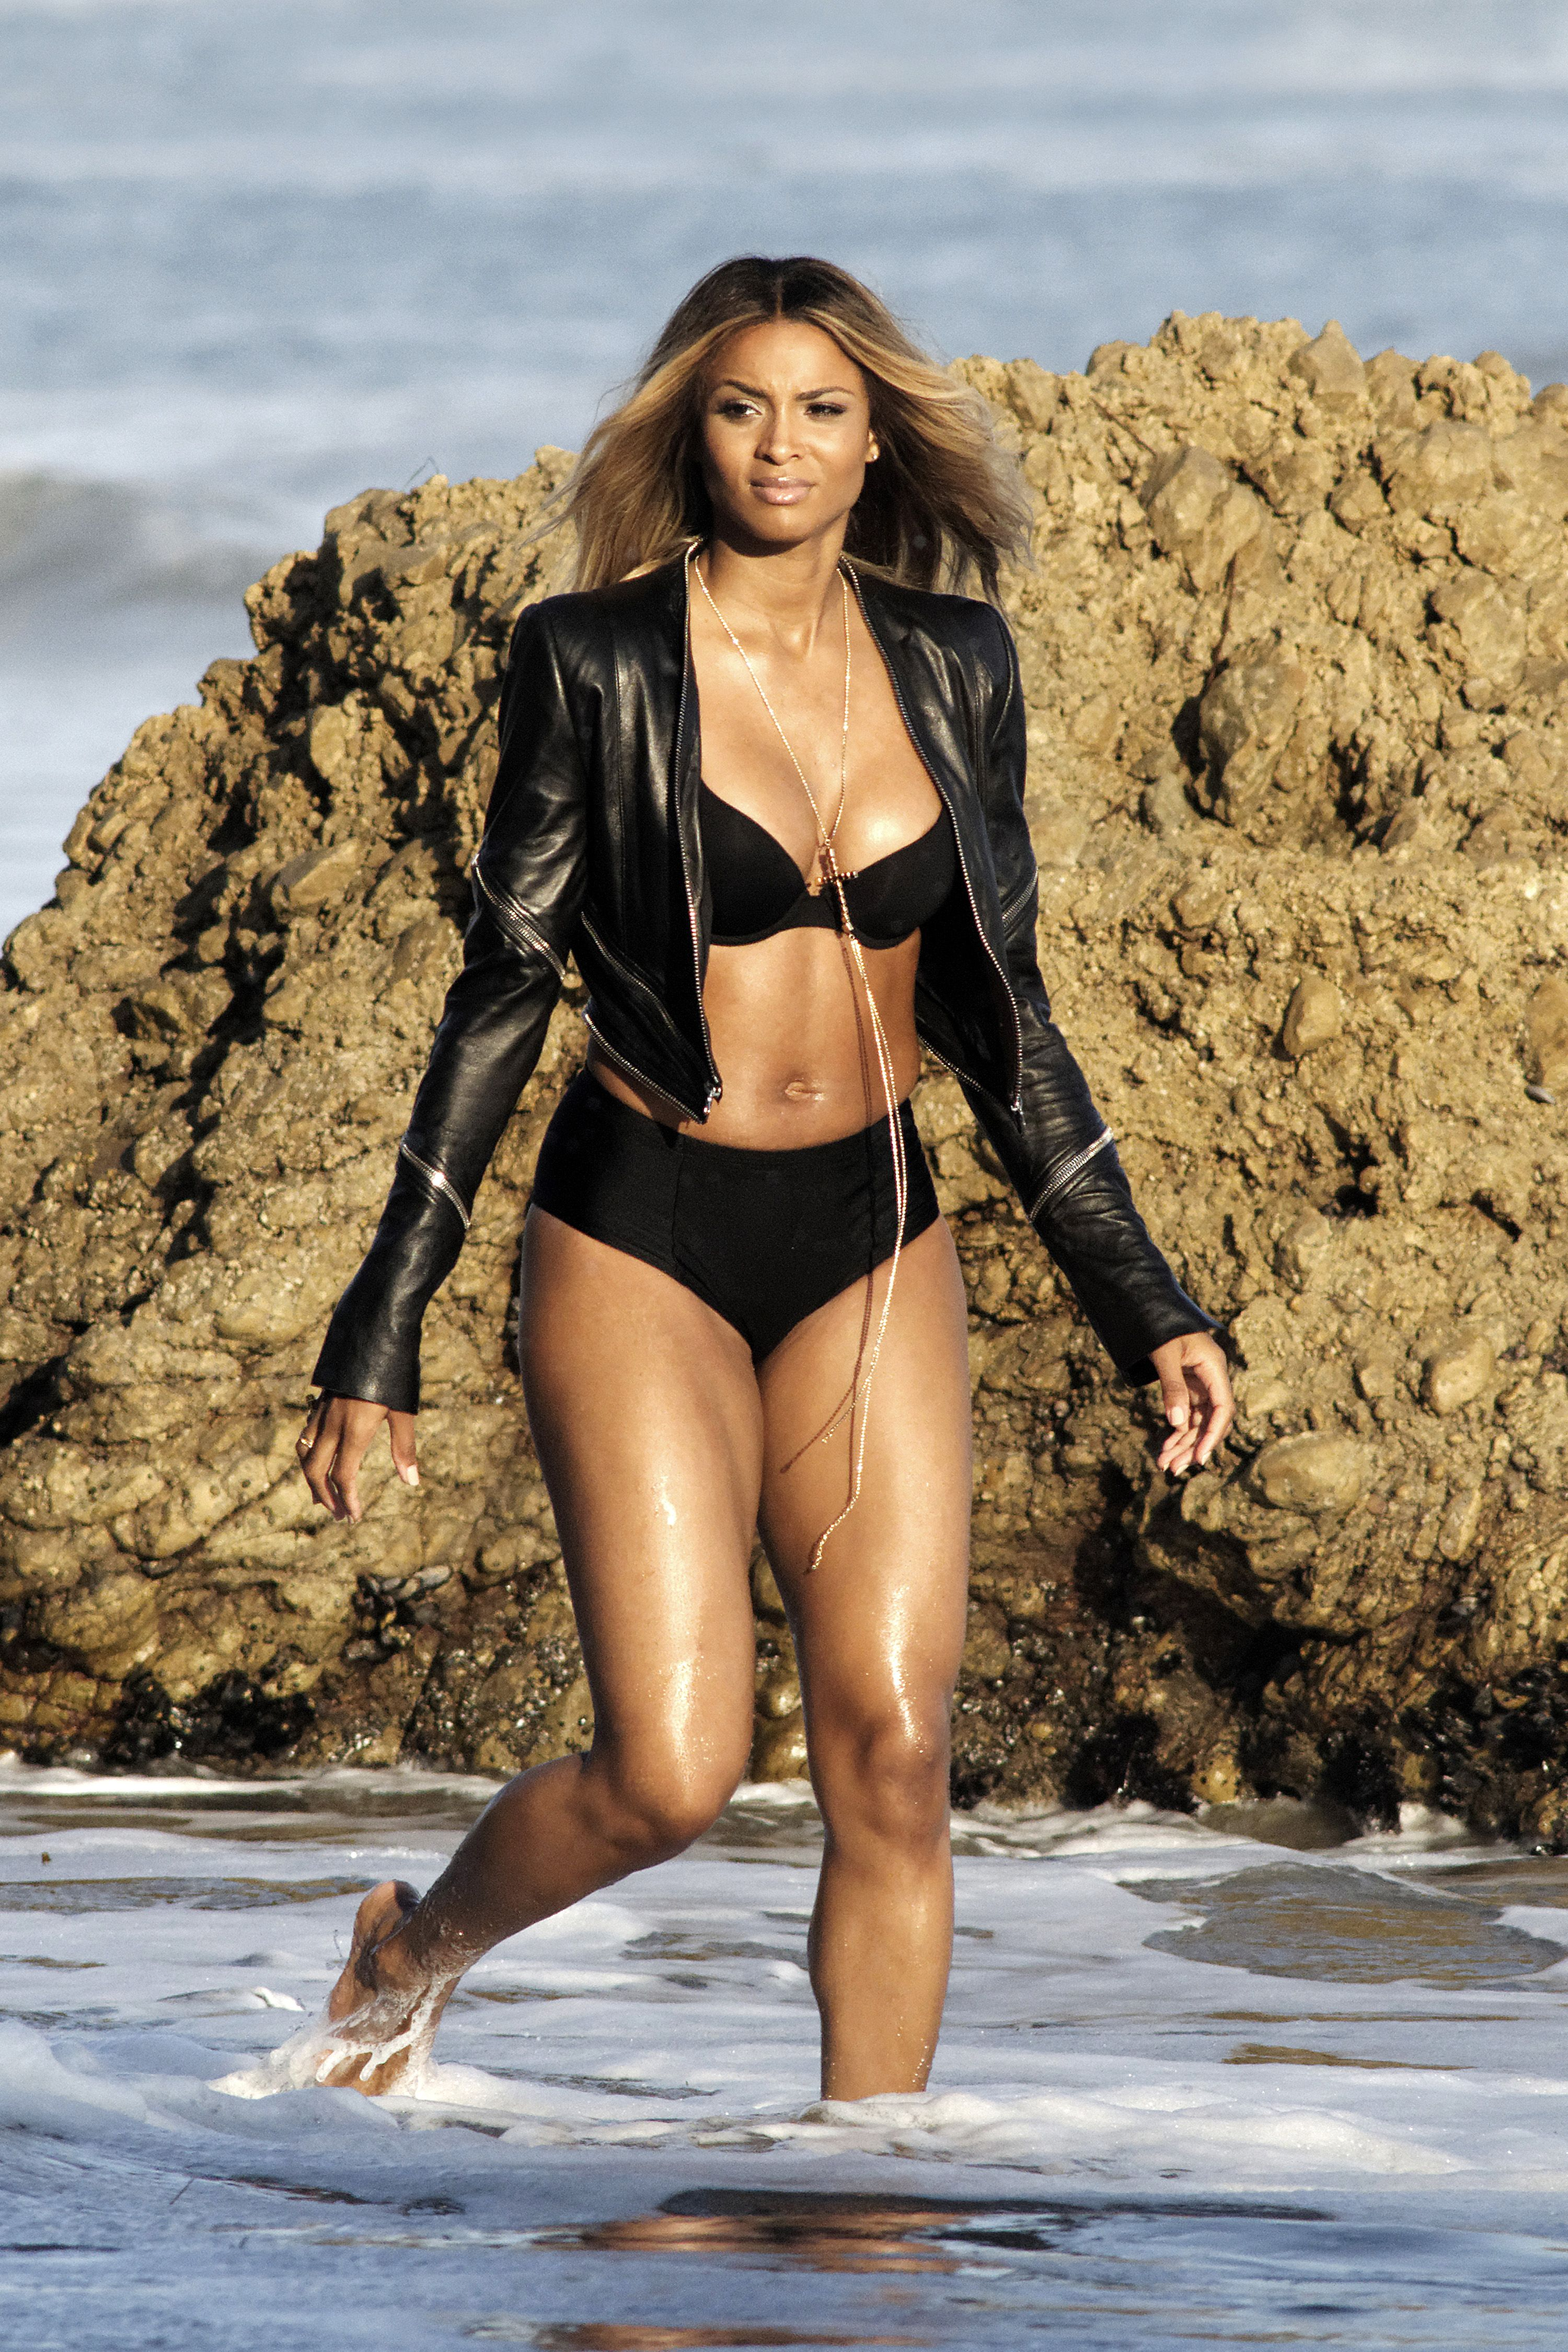 Bikini Ciara nude photos 2019